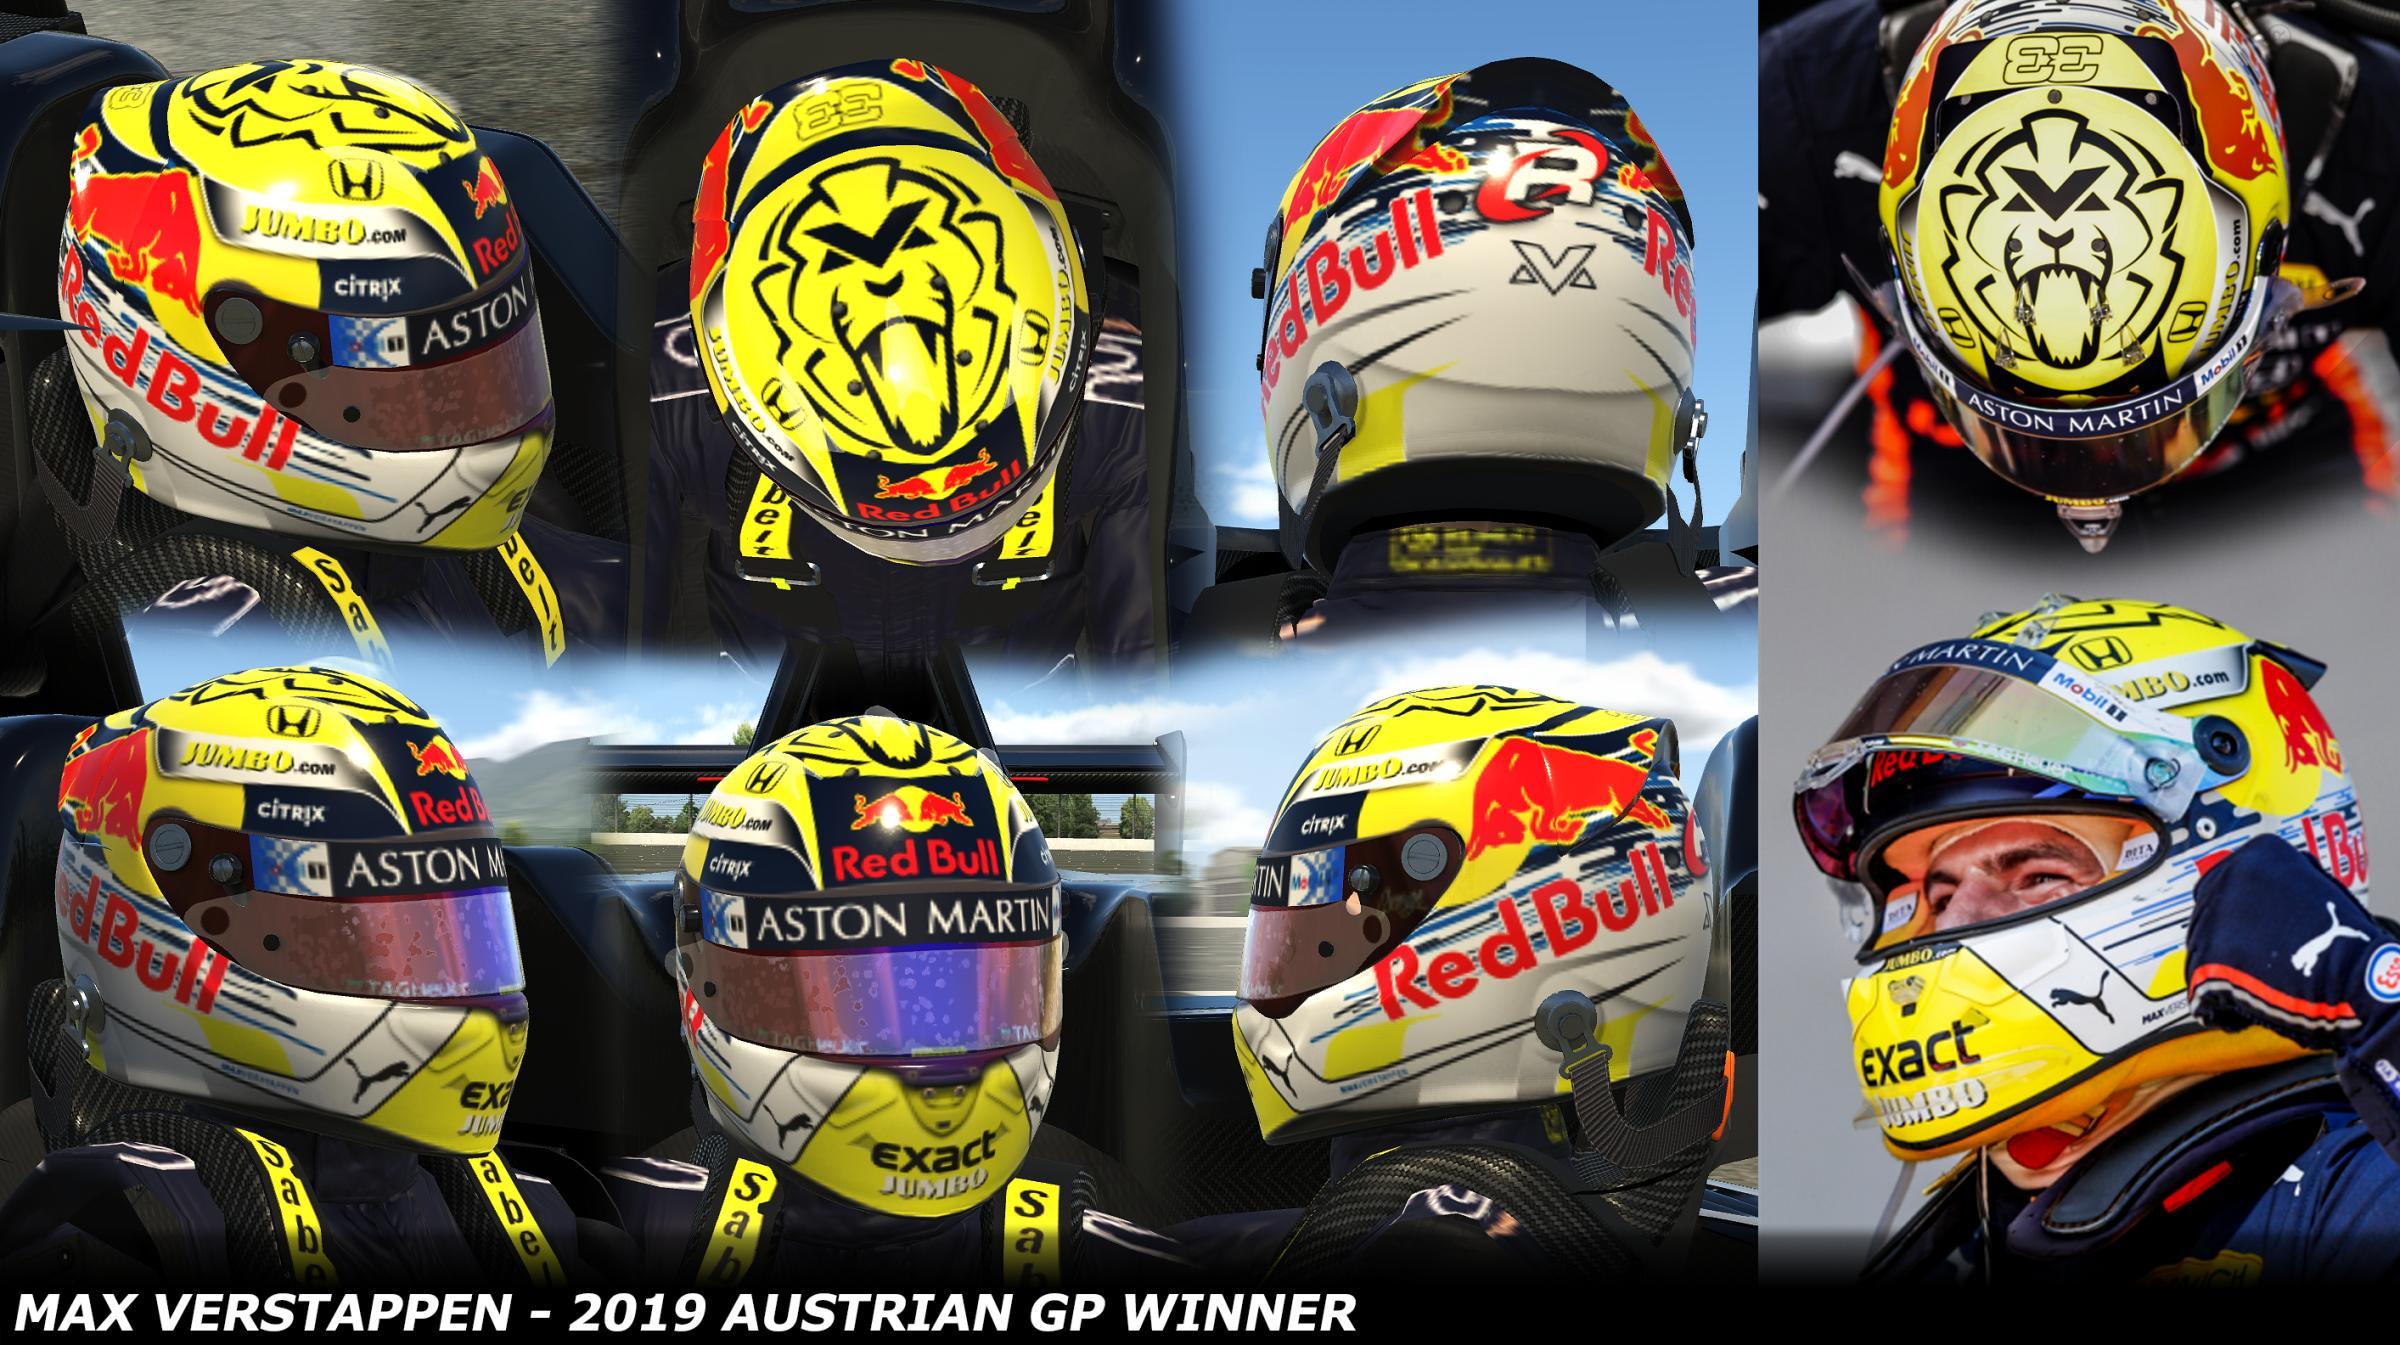 Preview of Max Verstappen 2019 - Austrian GP Winner by George Simmons